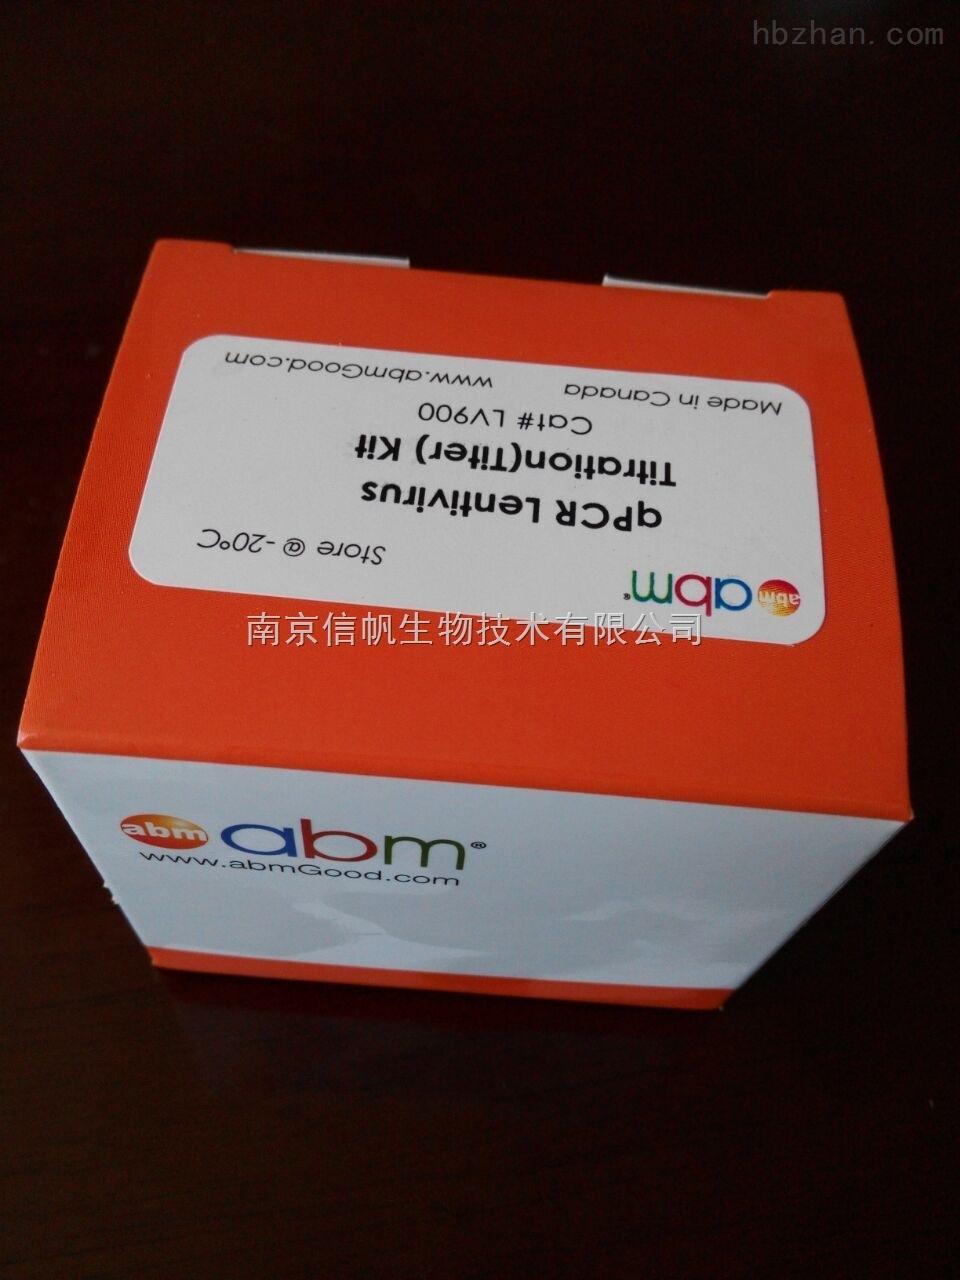 NADPH-细胞色素C还原酶(NCR)试剂盒